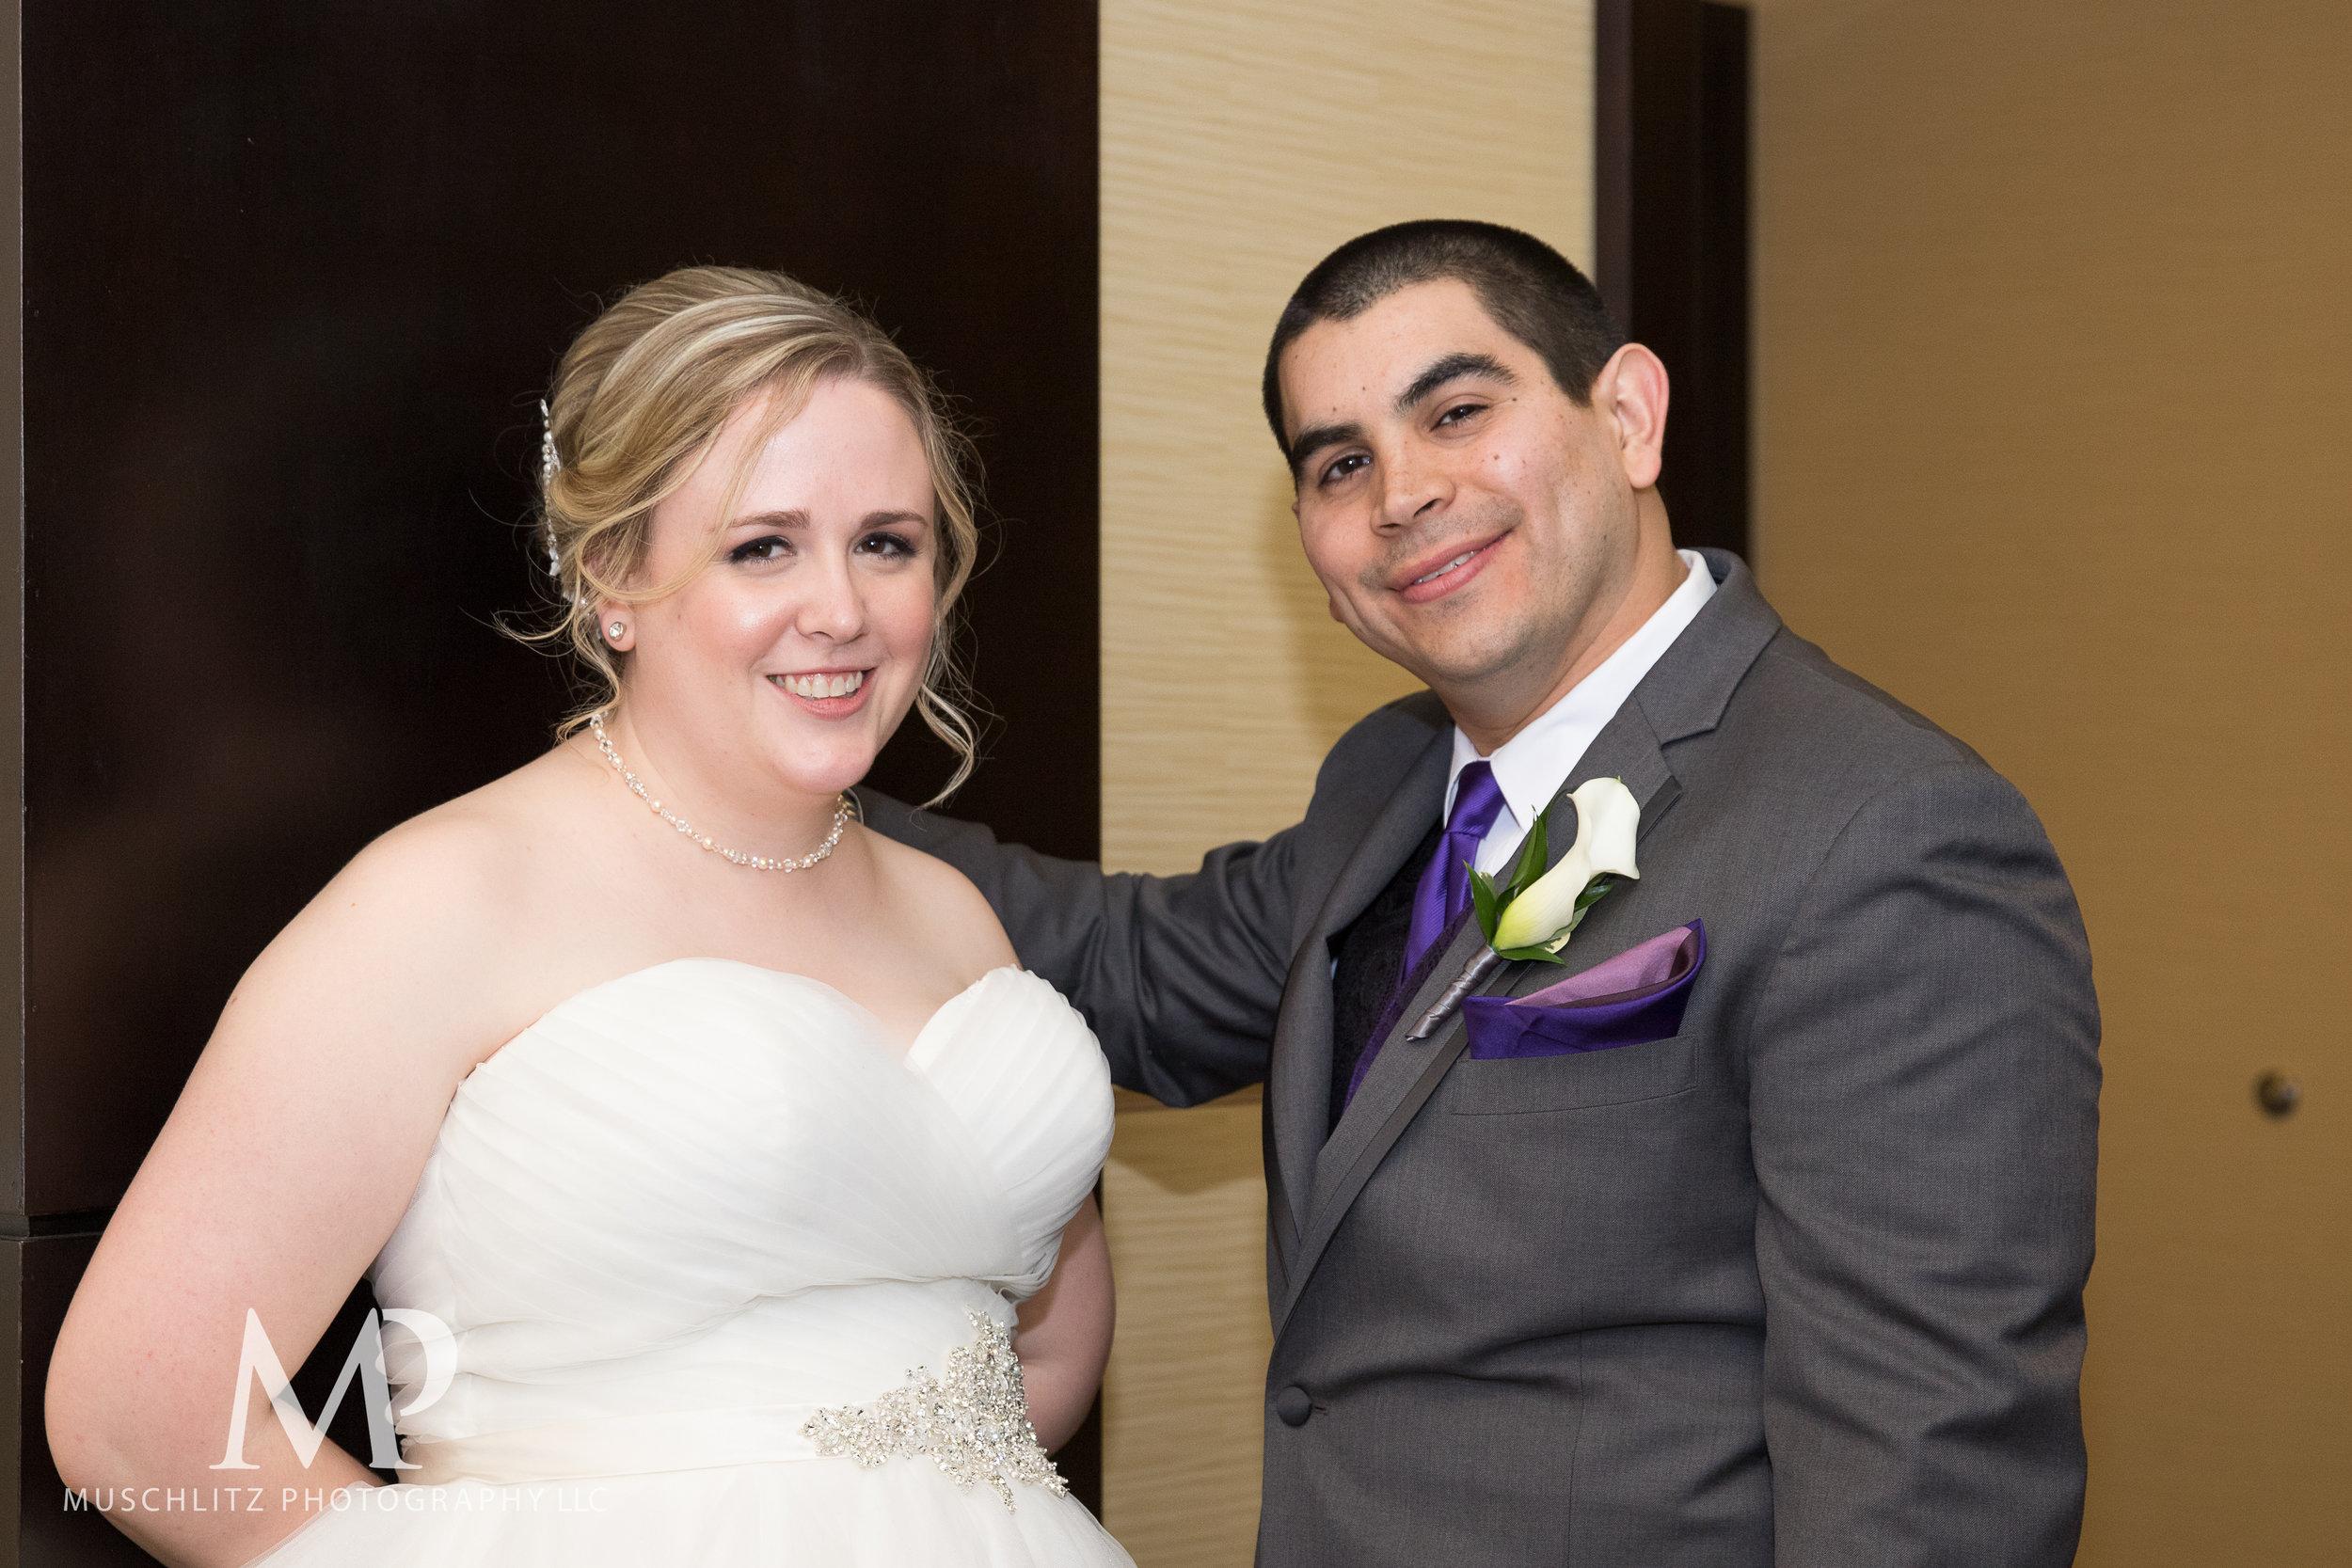 hilton-polaris-wedding-columbus-ohio-muschlitz-photography-012.JPG